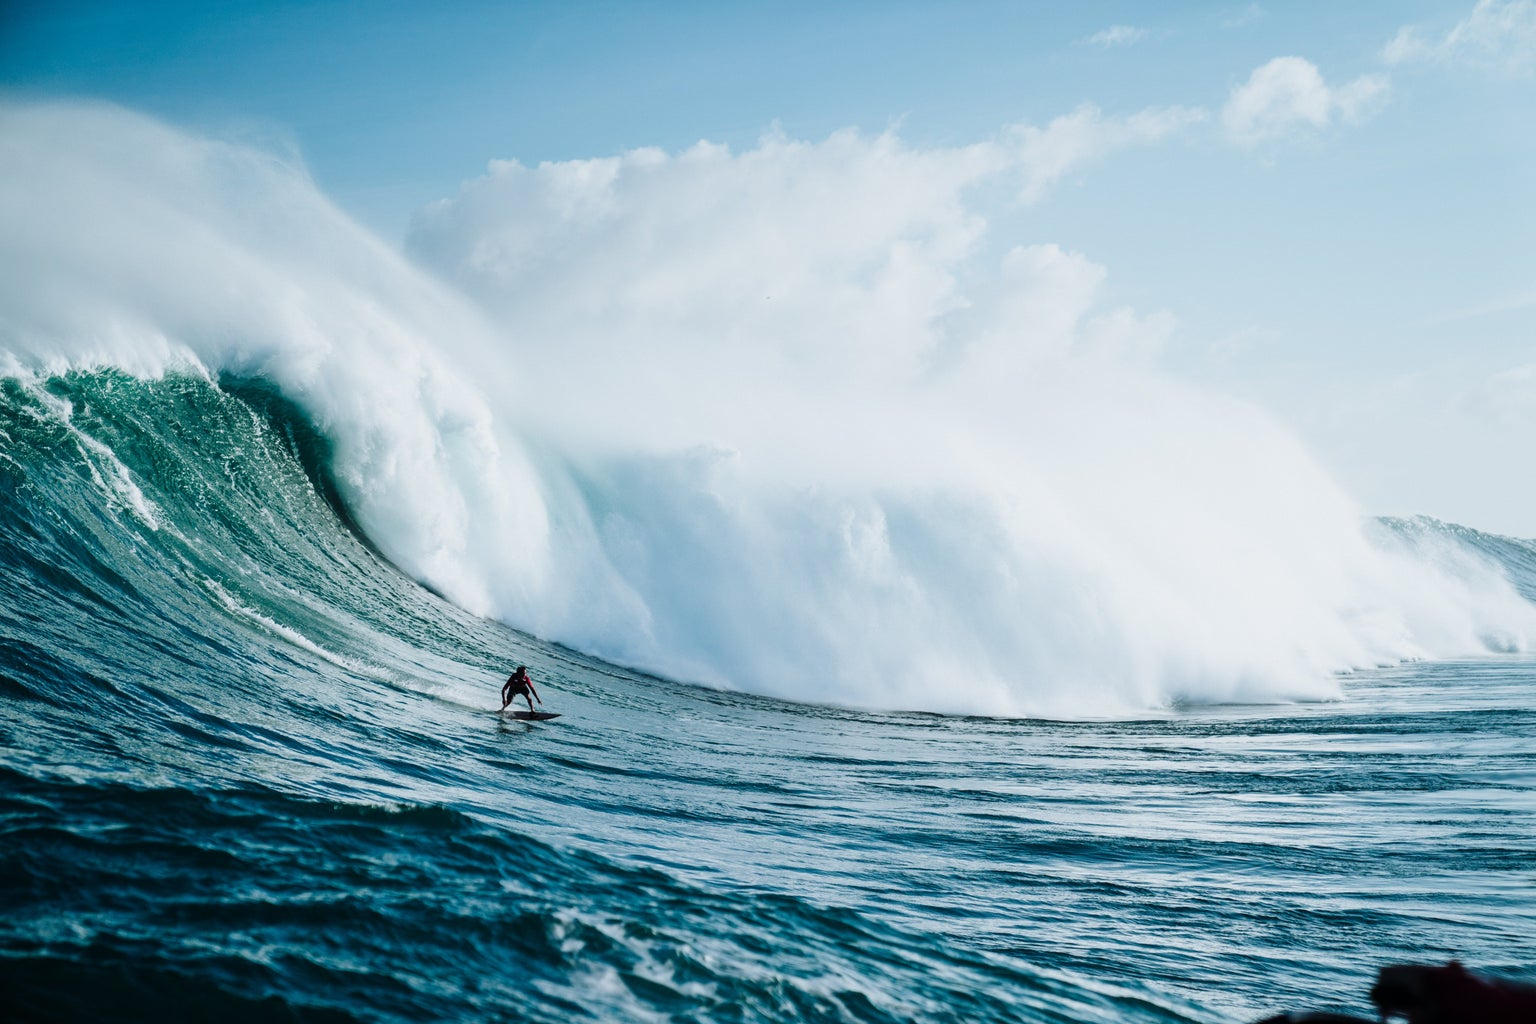 ocean wave surfing guy